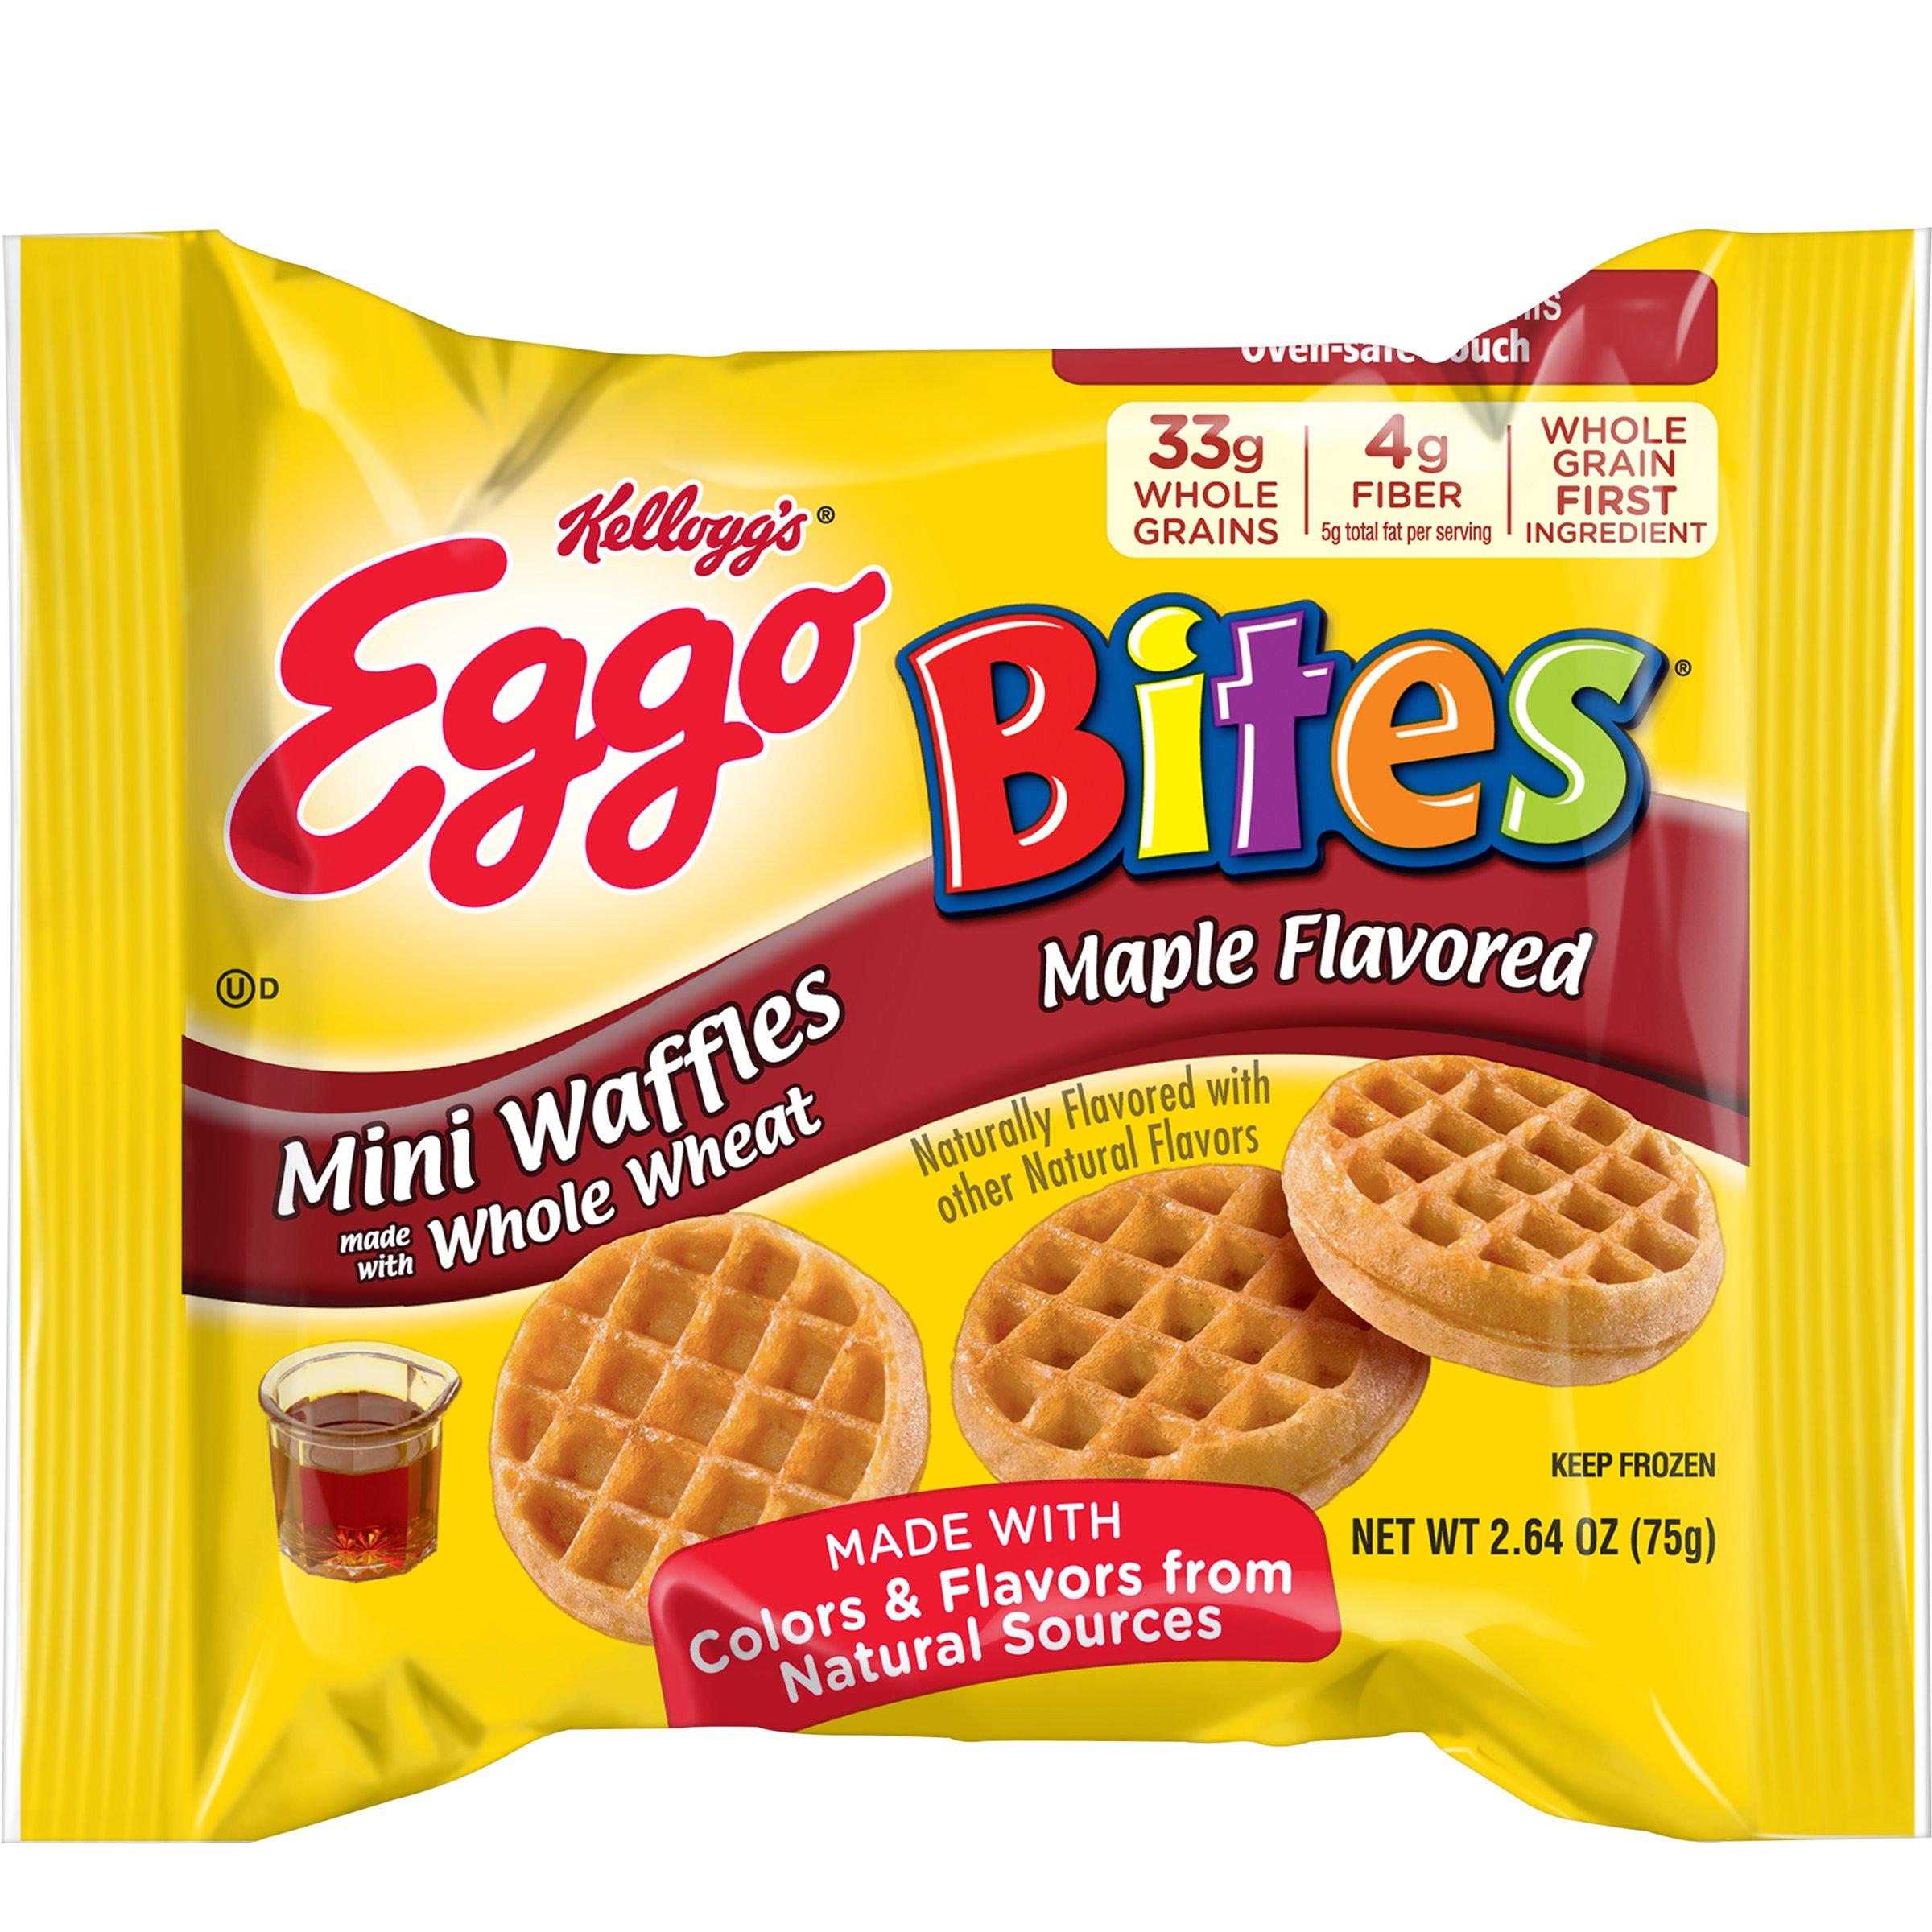 Kellogg's Eggo Waffle Bites Maple, 2.64 oz., (72 count)